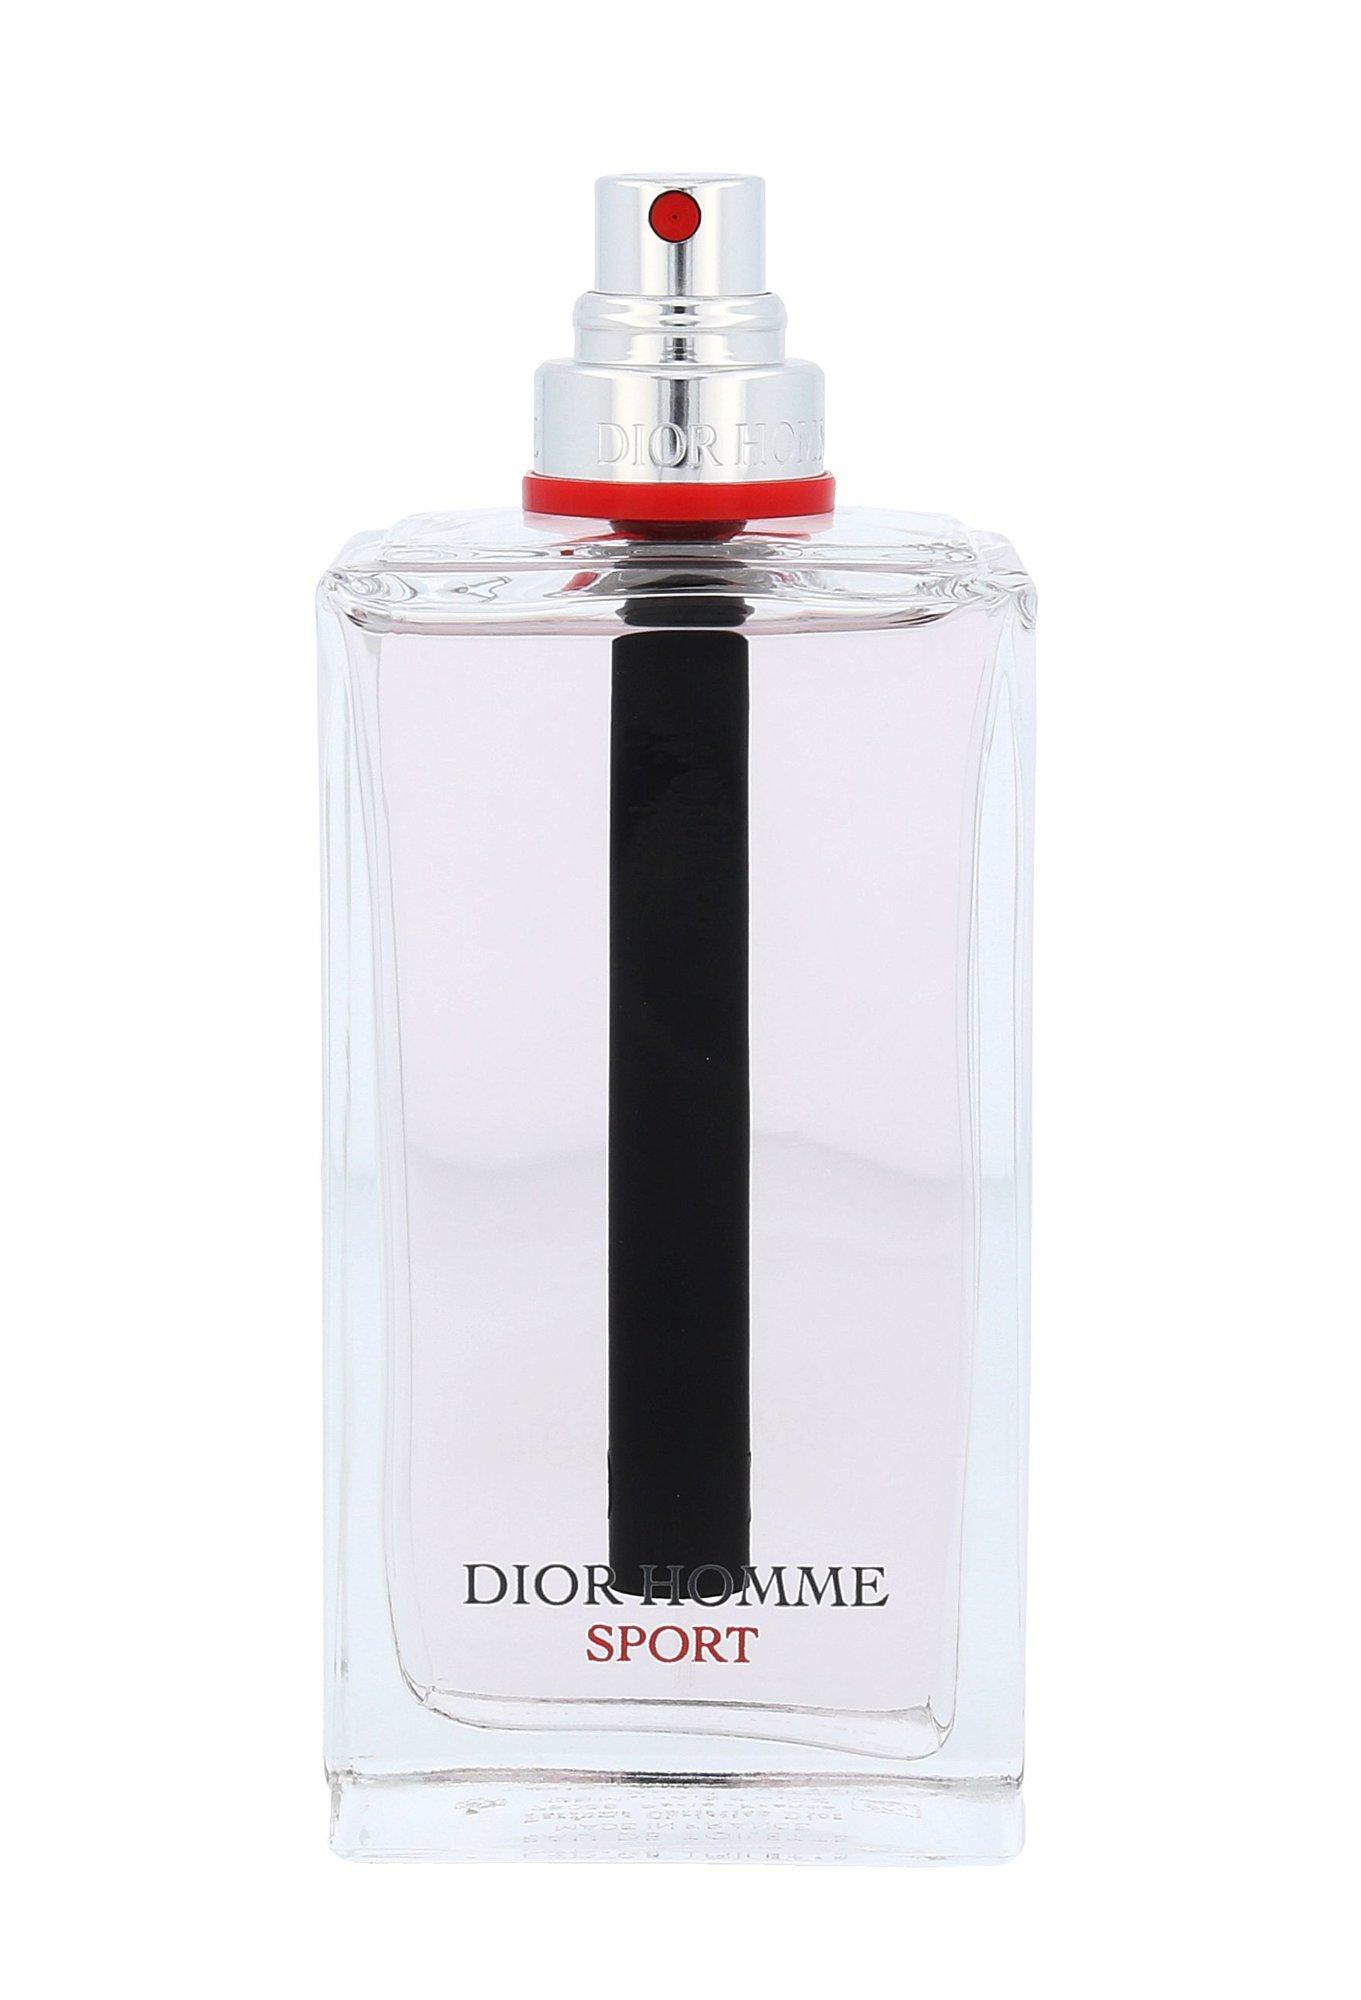 Christian Dior Dior Homme Sport EDT 125ml